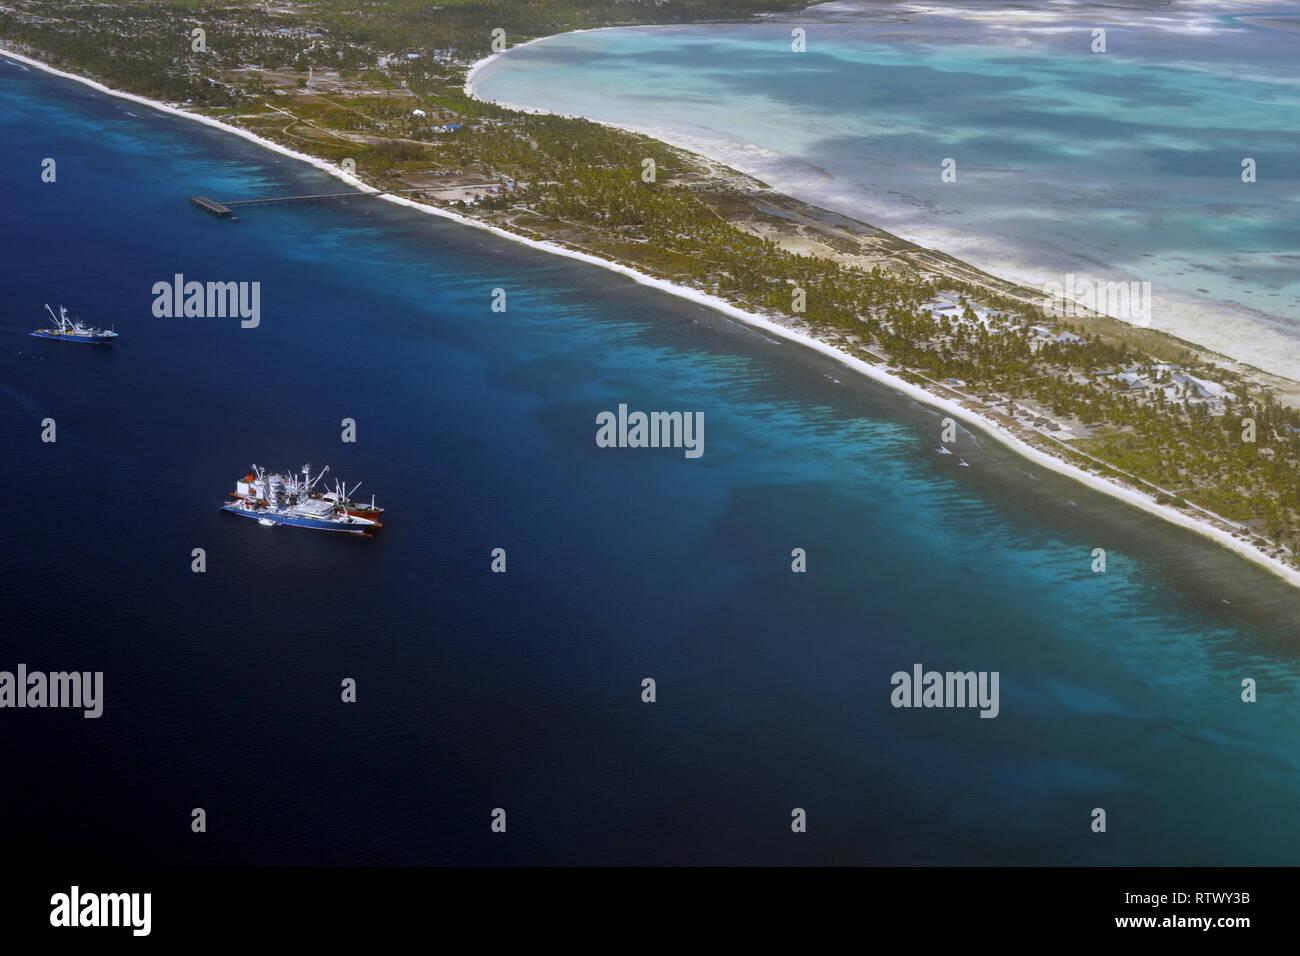 Aerial view of Christmas Island (Kiritimati),  Kiribati - Stock Image